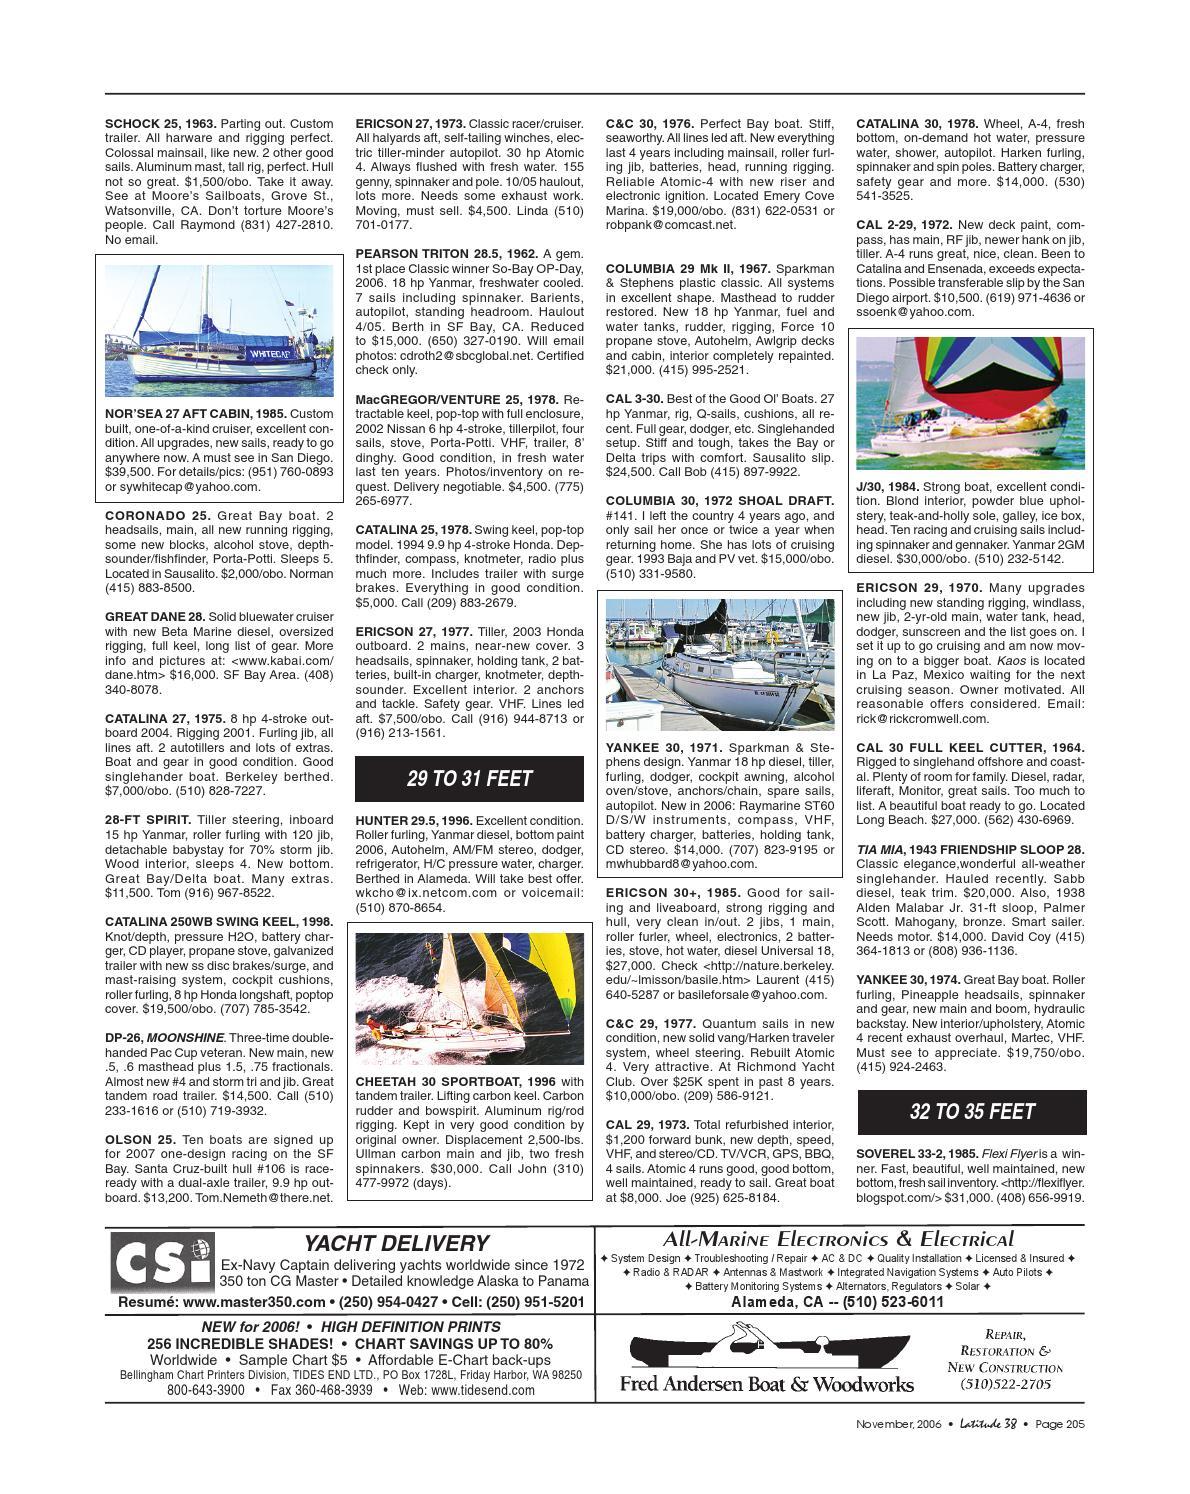 Latitude 38 November 2006 by Latitude 38 Media, LLC - issuu